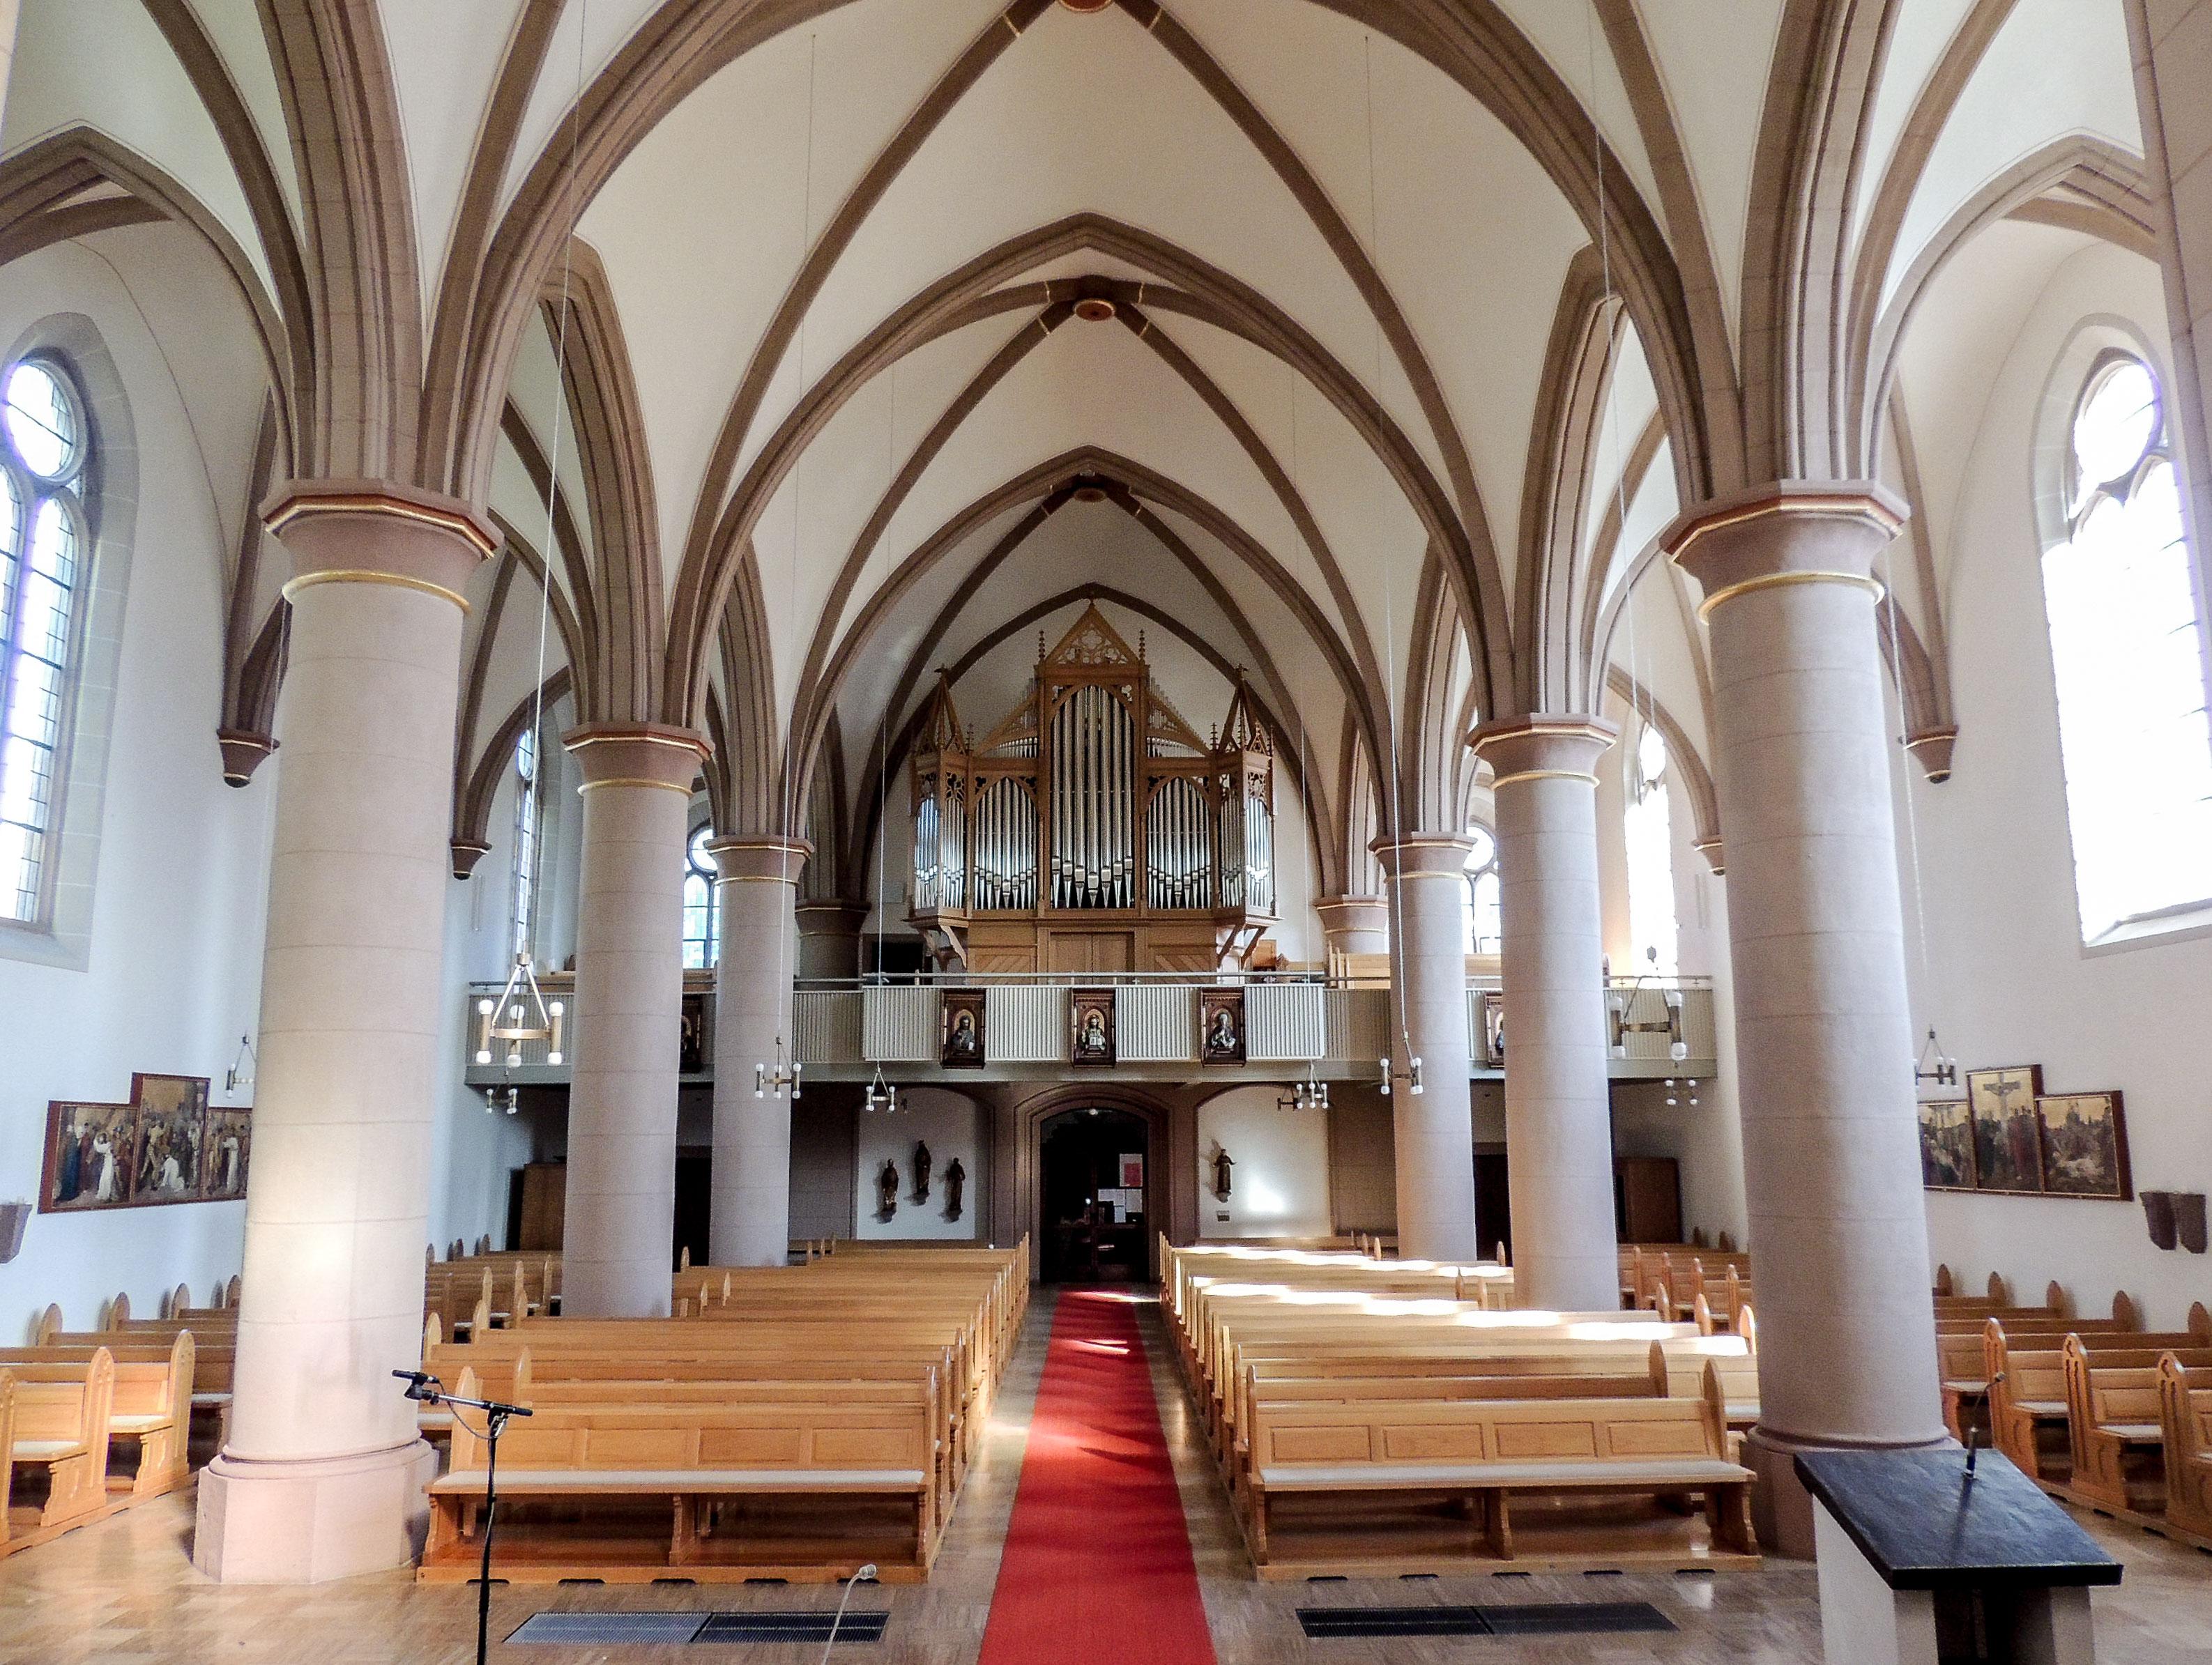 Kath. Pfarramt St. Maria Magdalena ,37327 Leinefelde